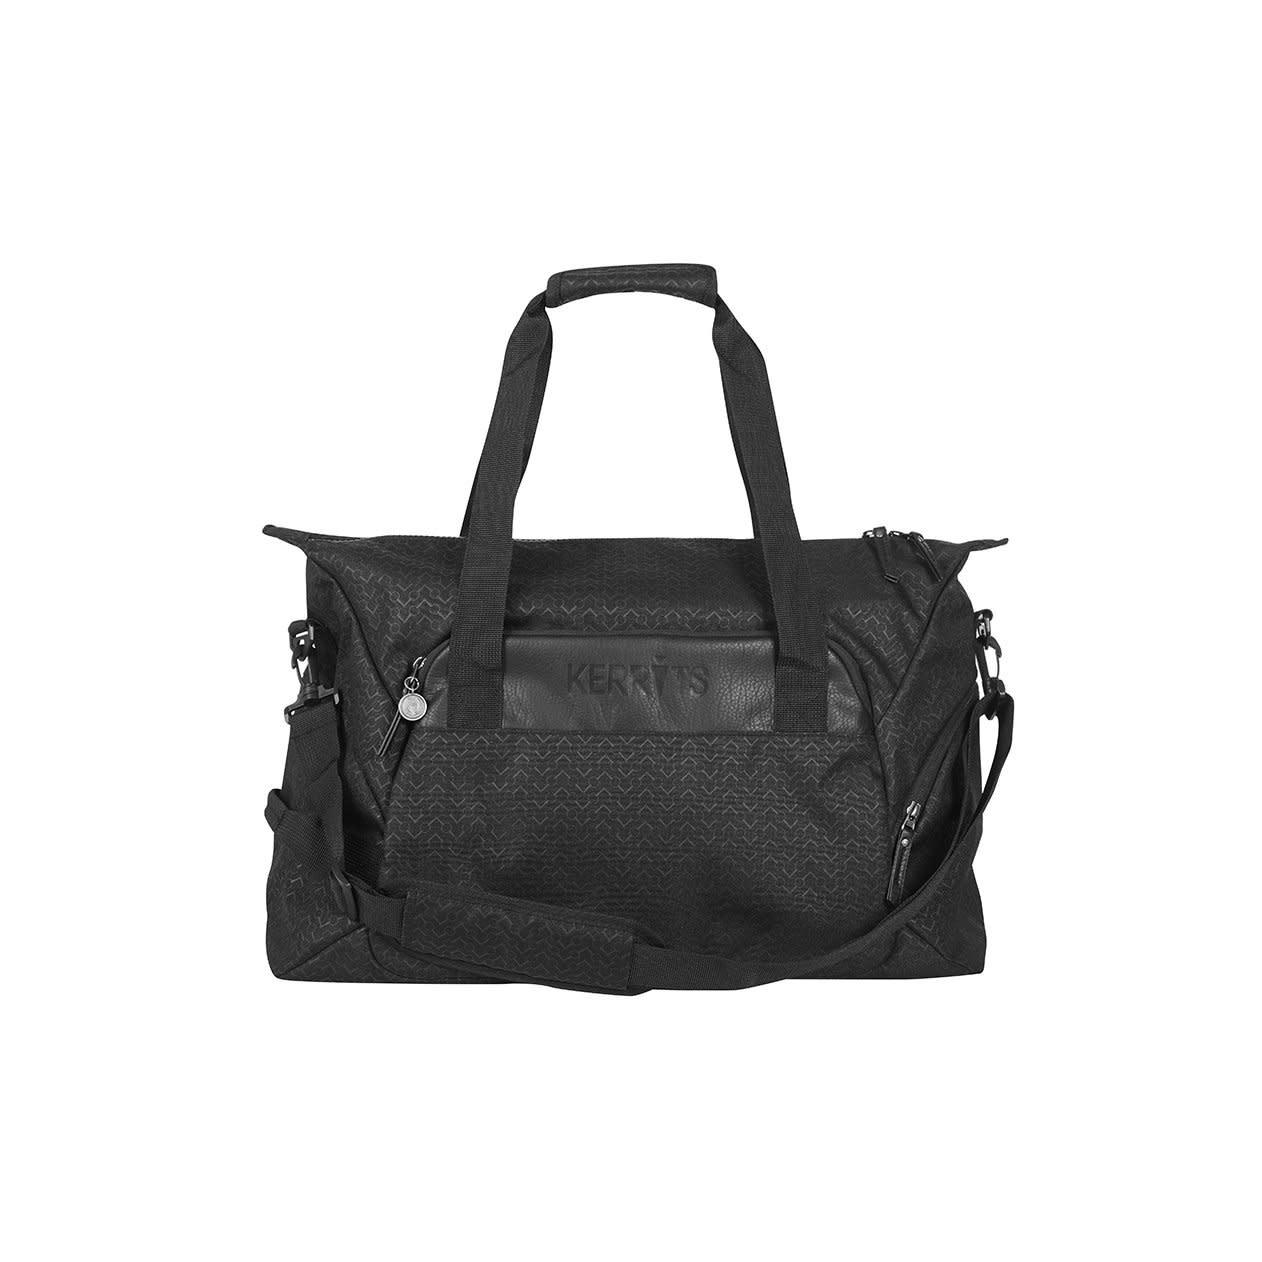 Kerrits Kerrits Duffle Bag, Black Chevron Bits